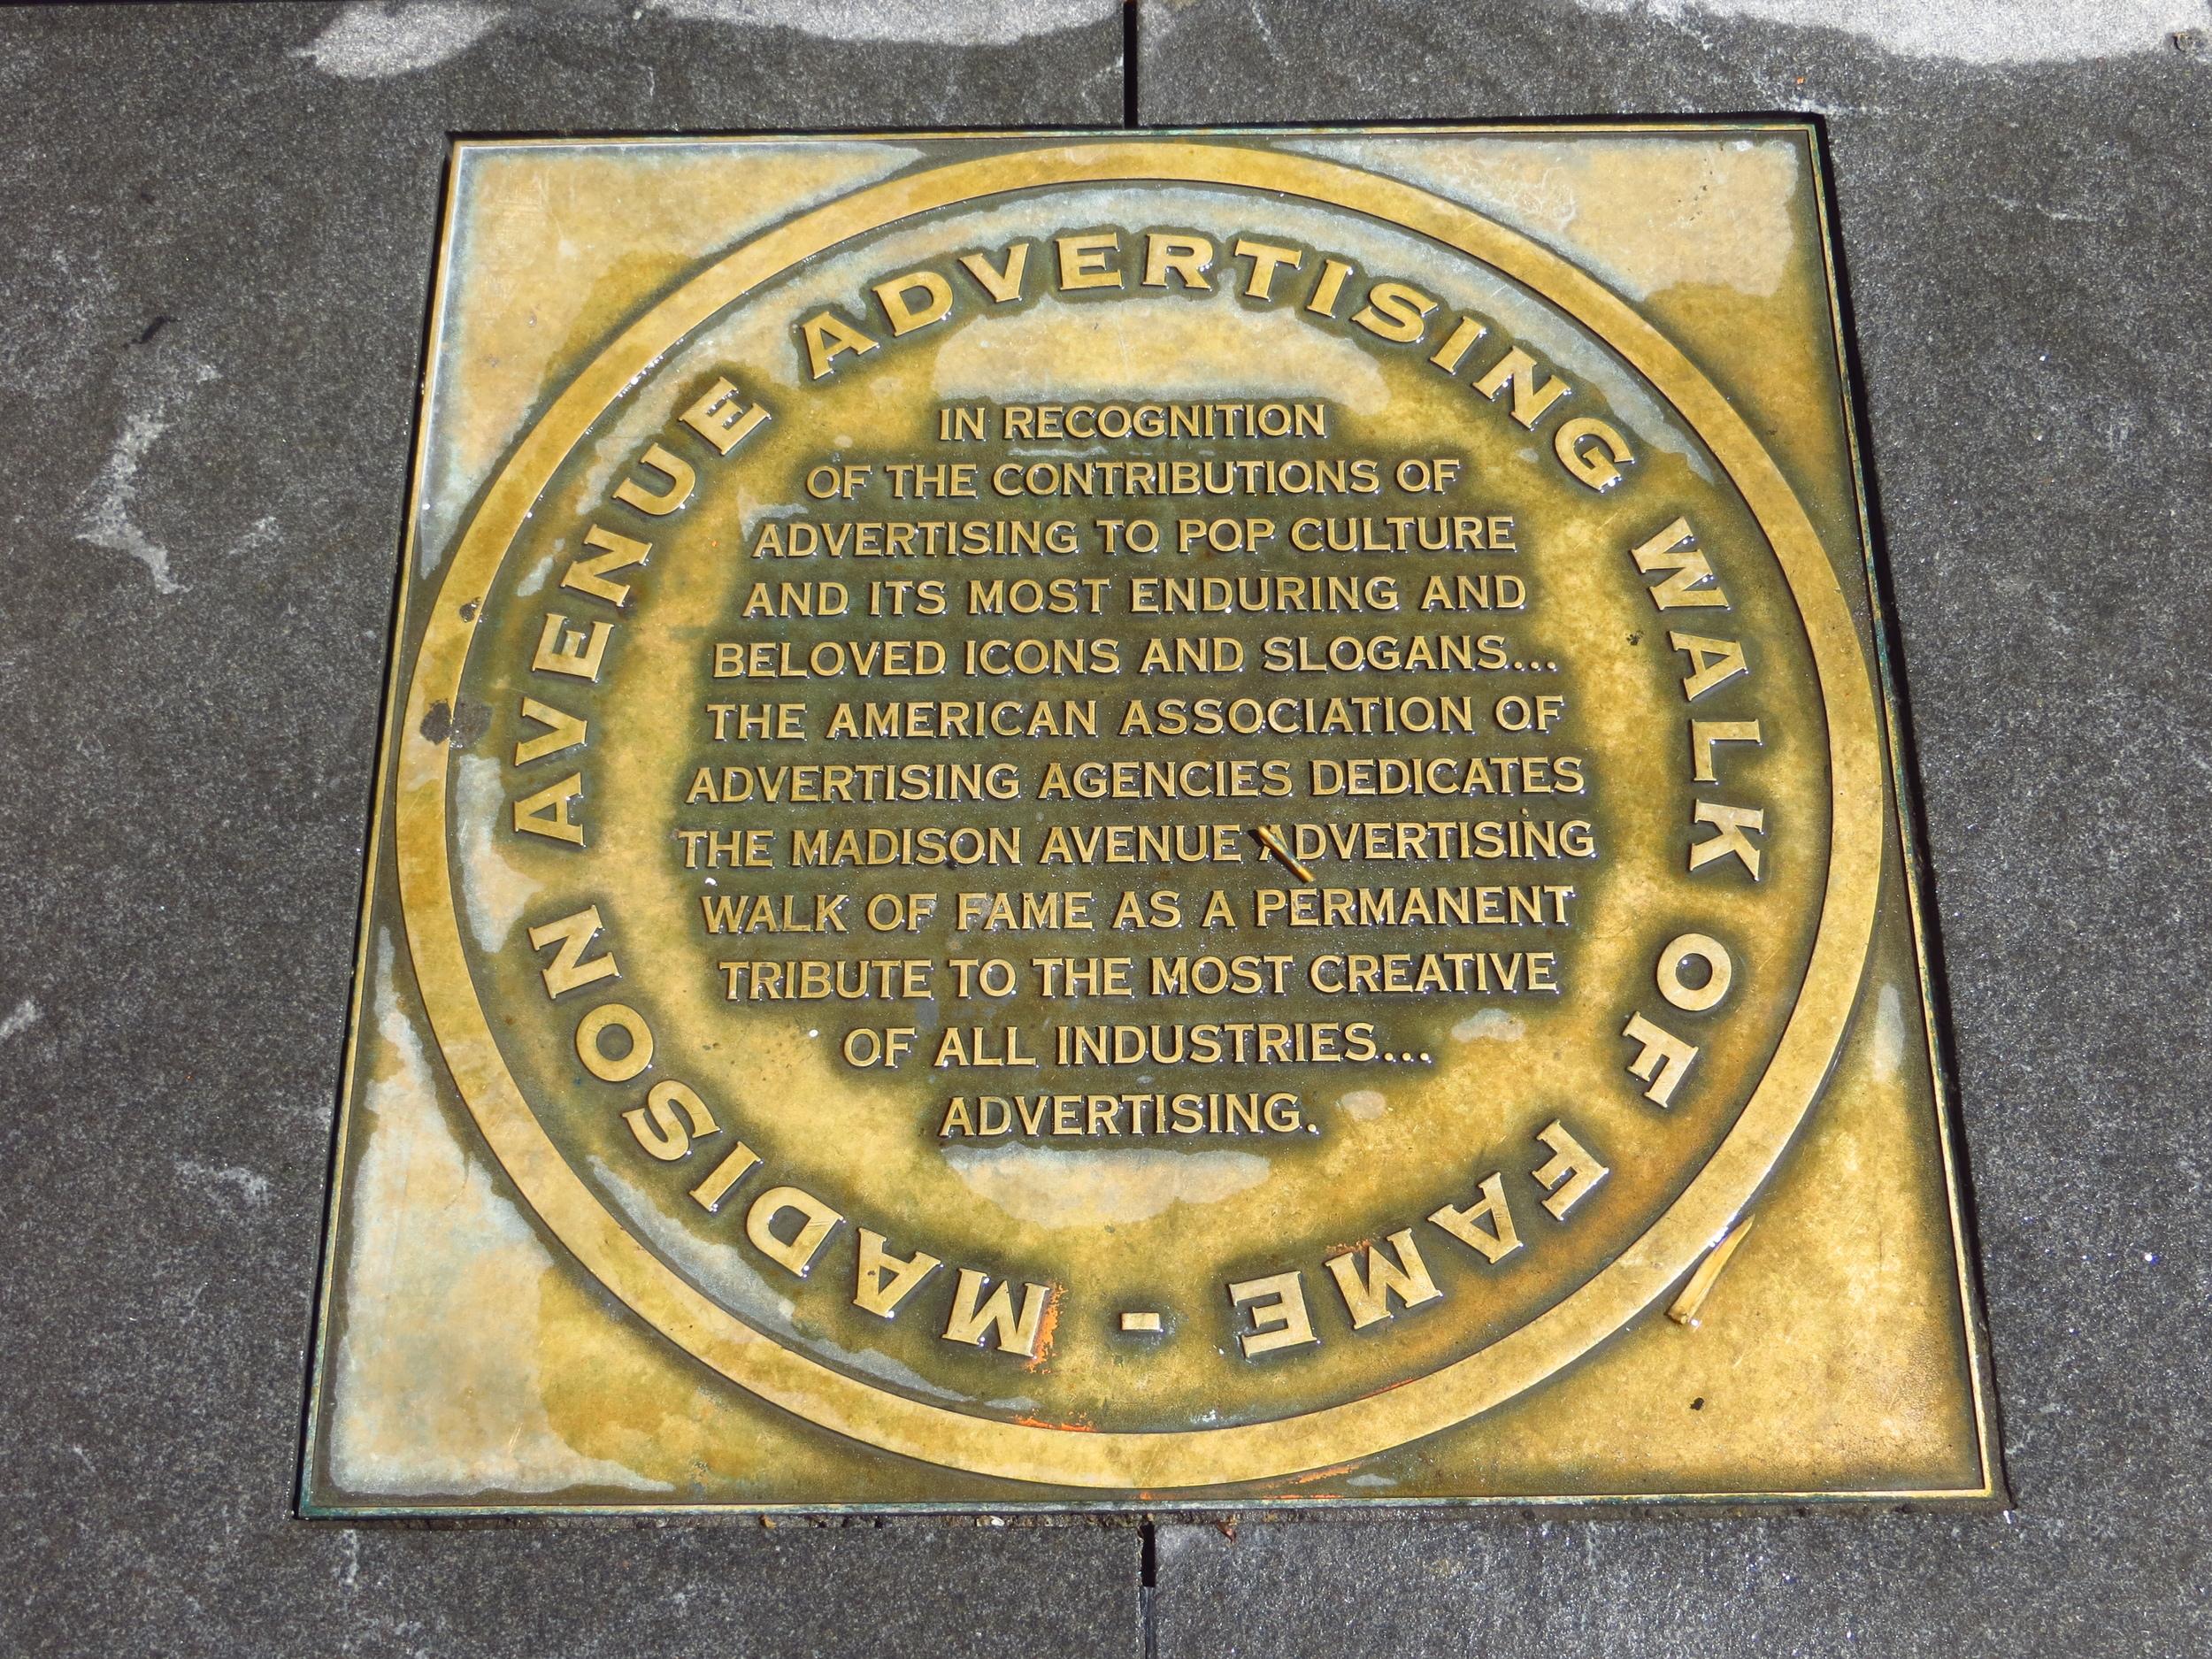 Madison Avenue Advertising Walk of Fame